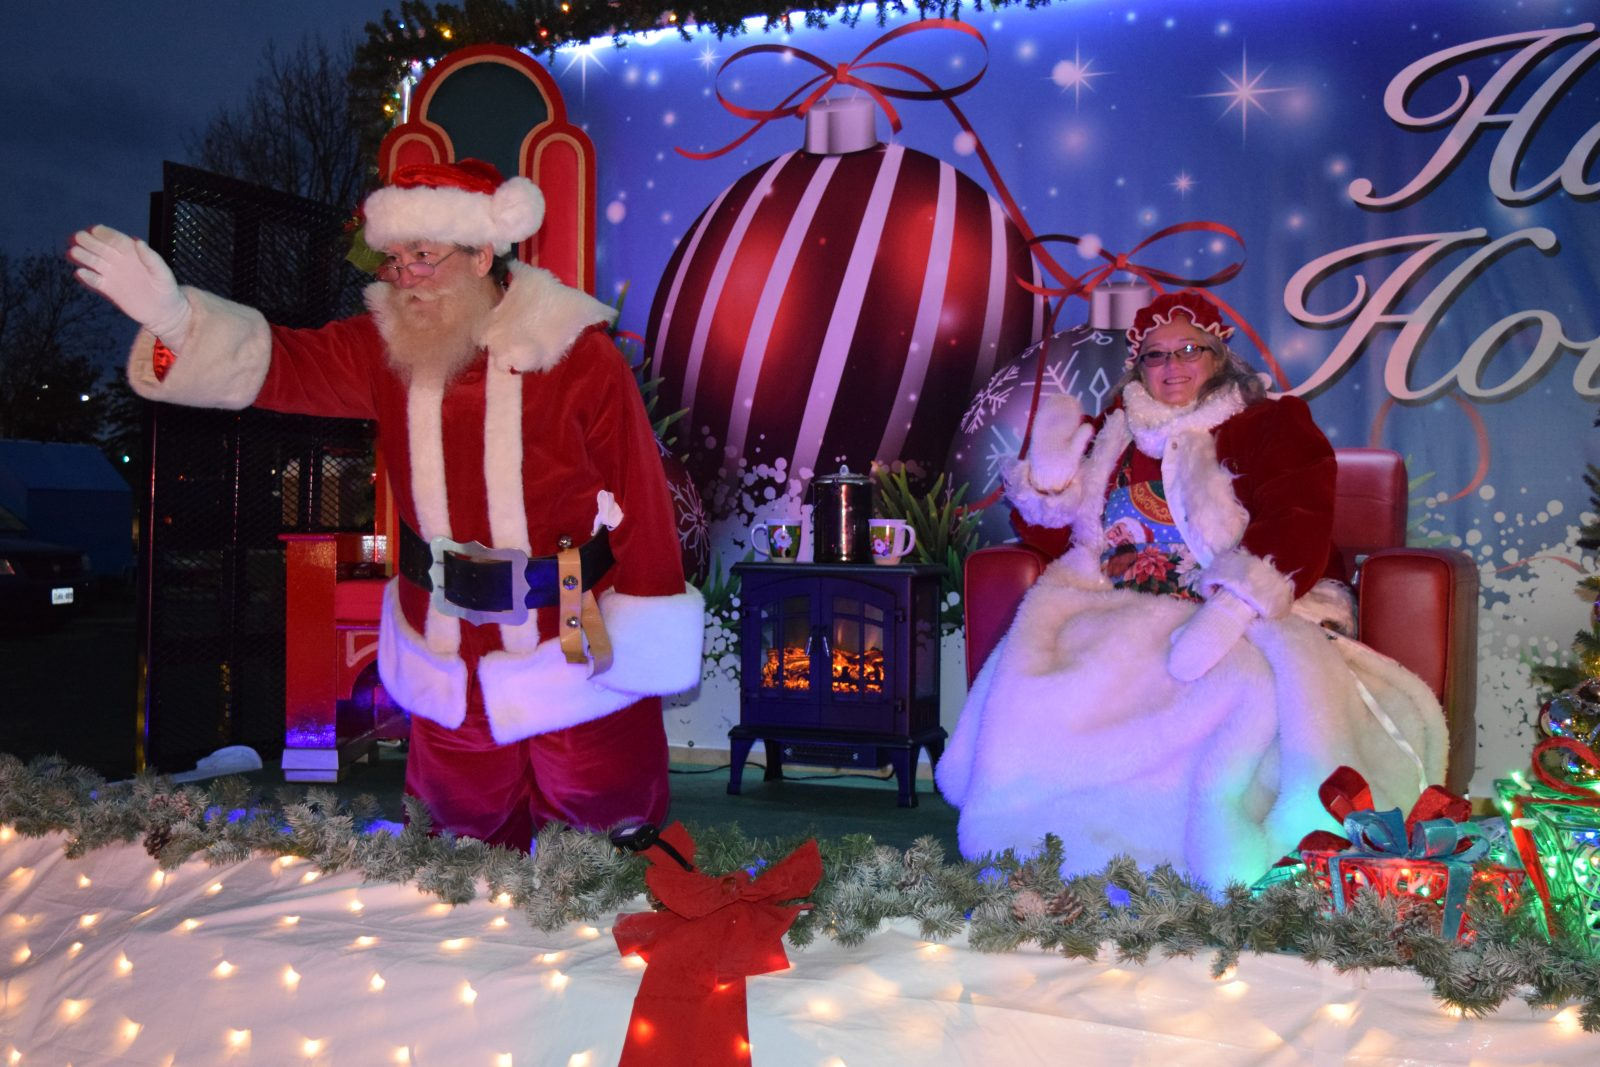 SLIDESHOW: Cornwall Christmas Parade